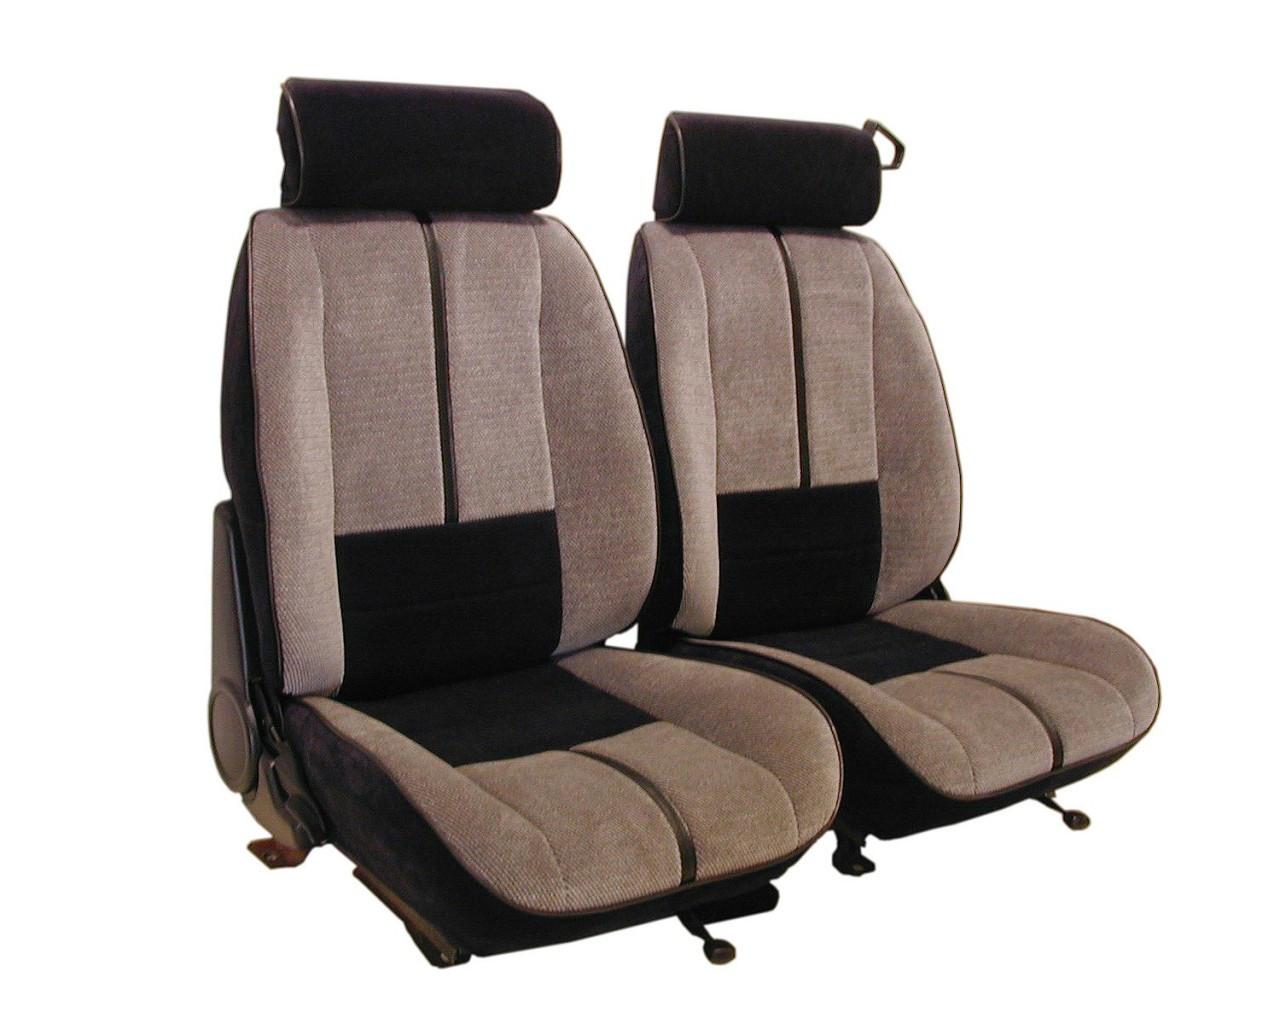 Camaro 88-92 Seat Upholstery Kit New Replacet - Hawks Third ...